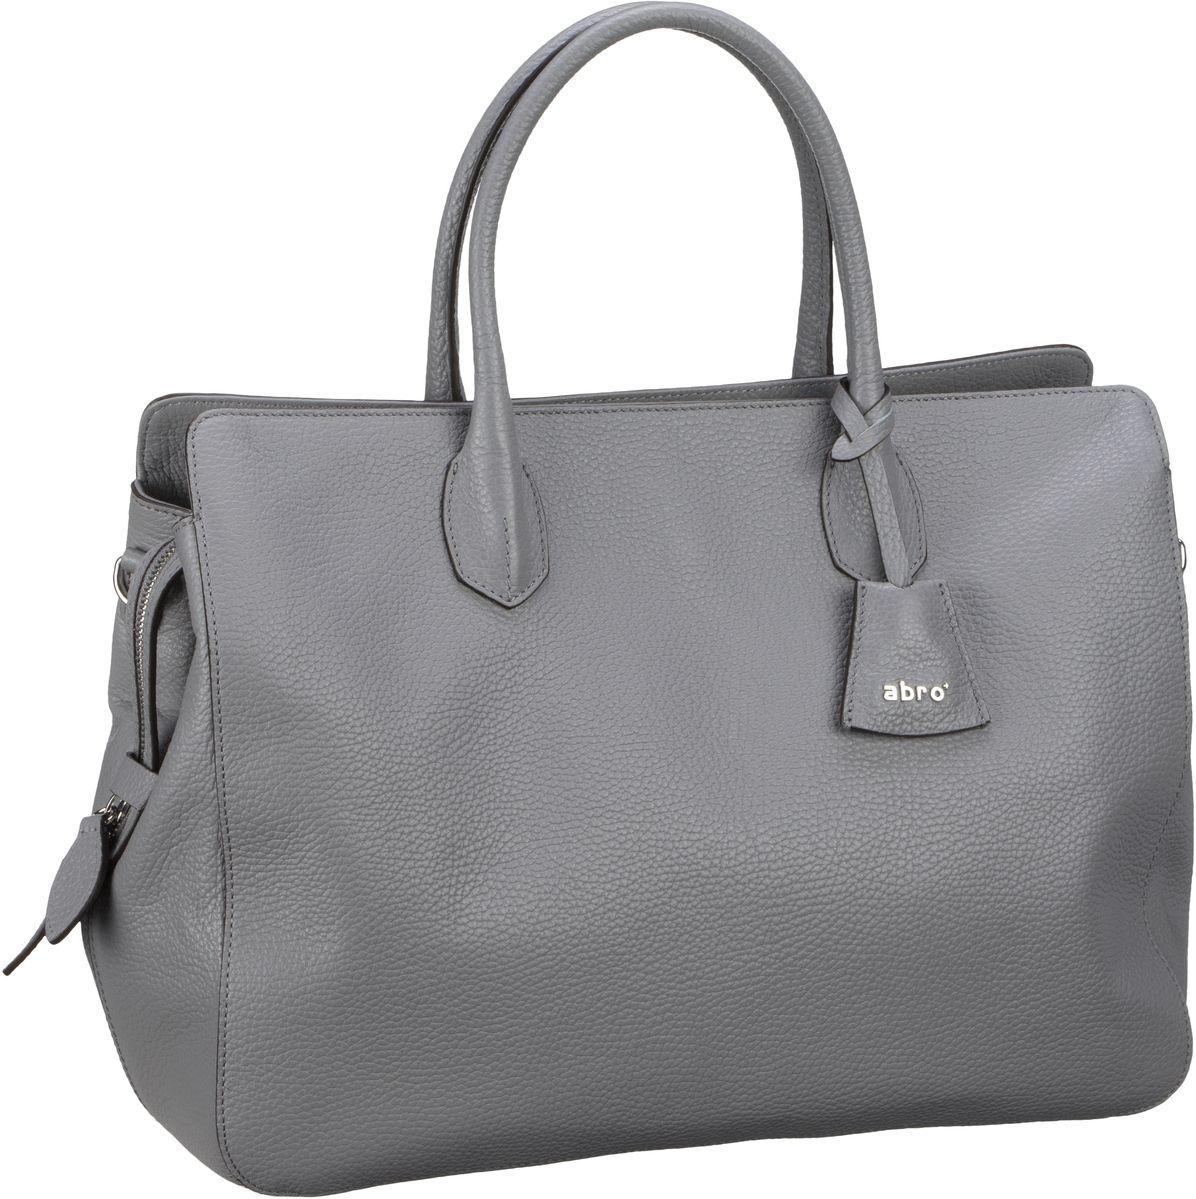 Abro CALF ADRIA - Handtasche - peony